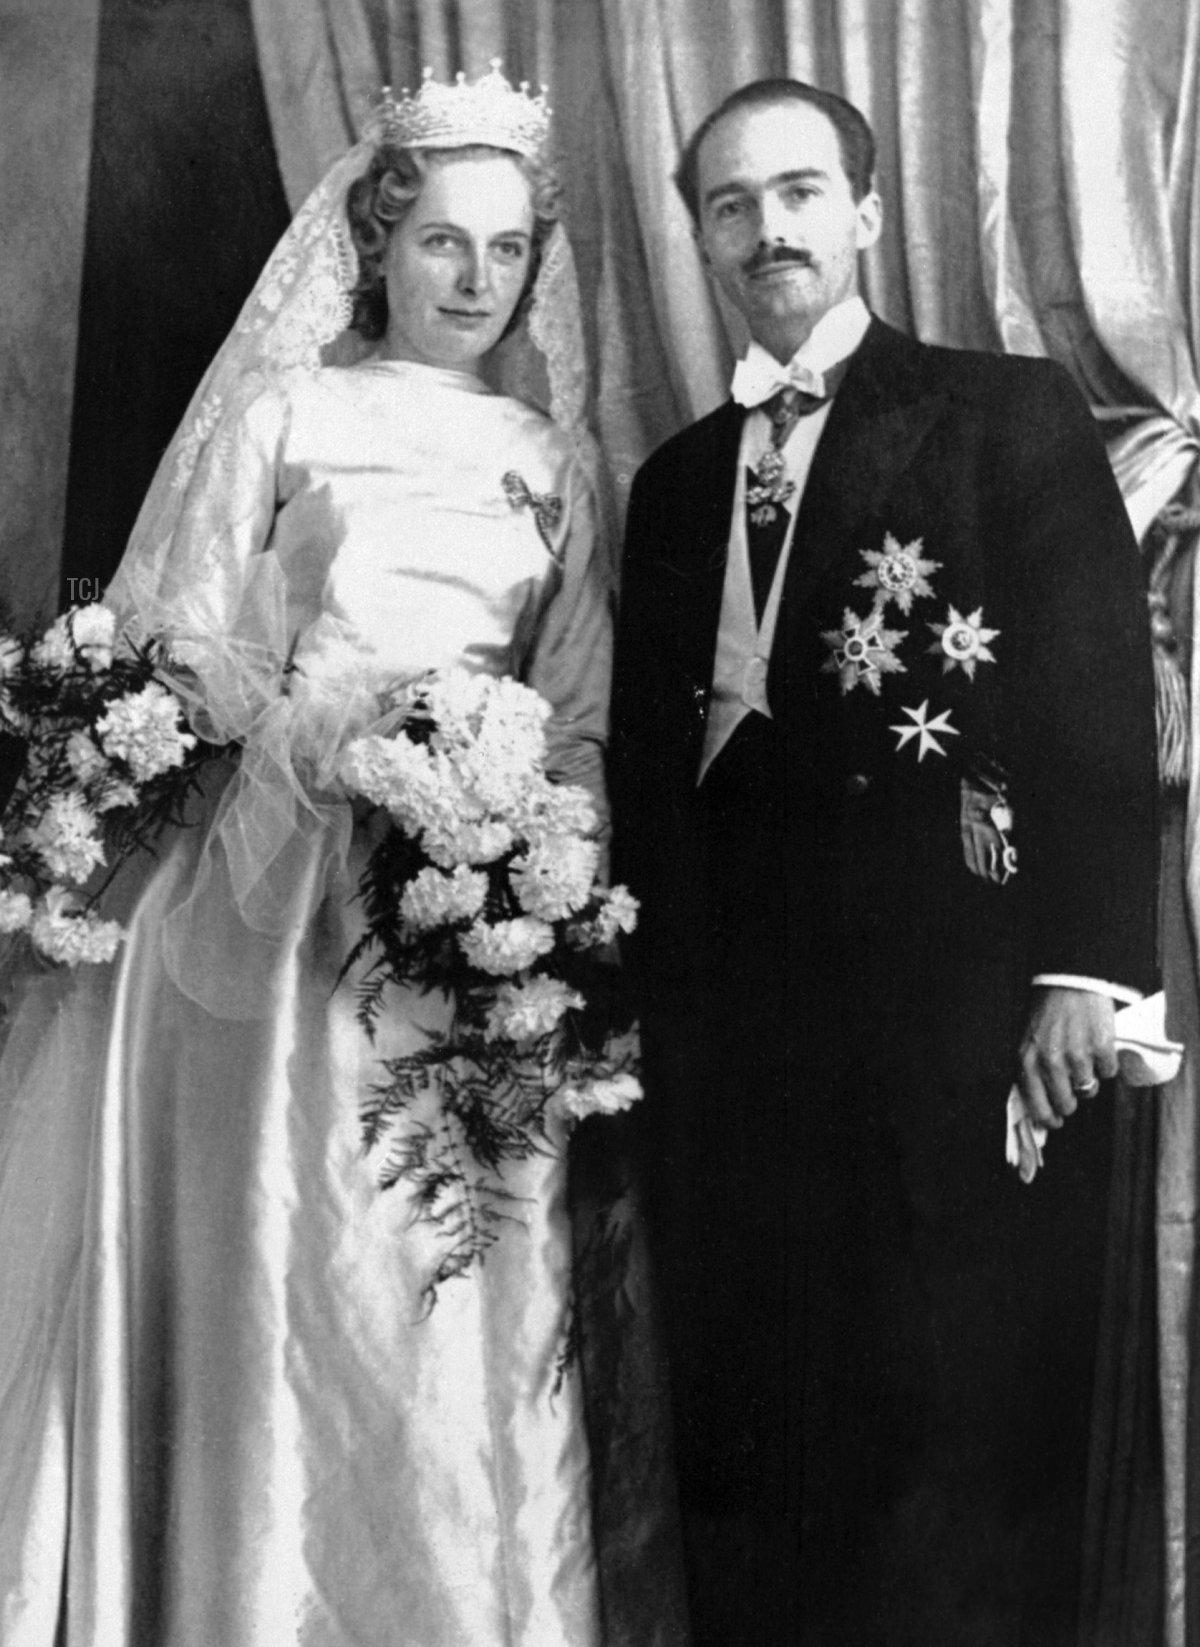 Archduke Otto and Archduchess Regina